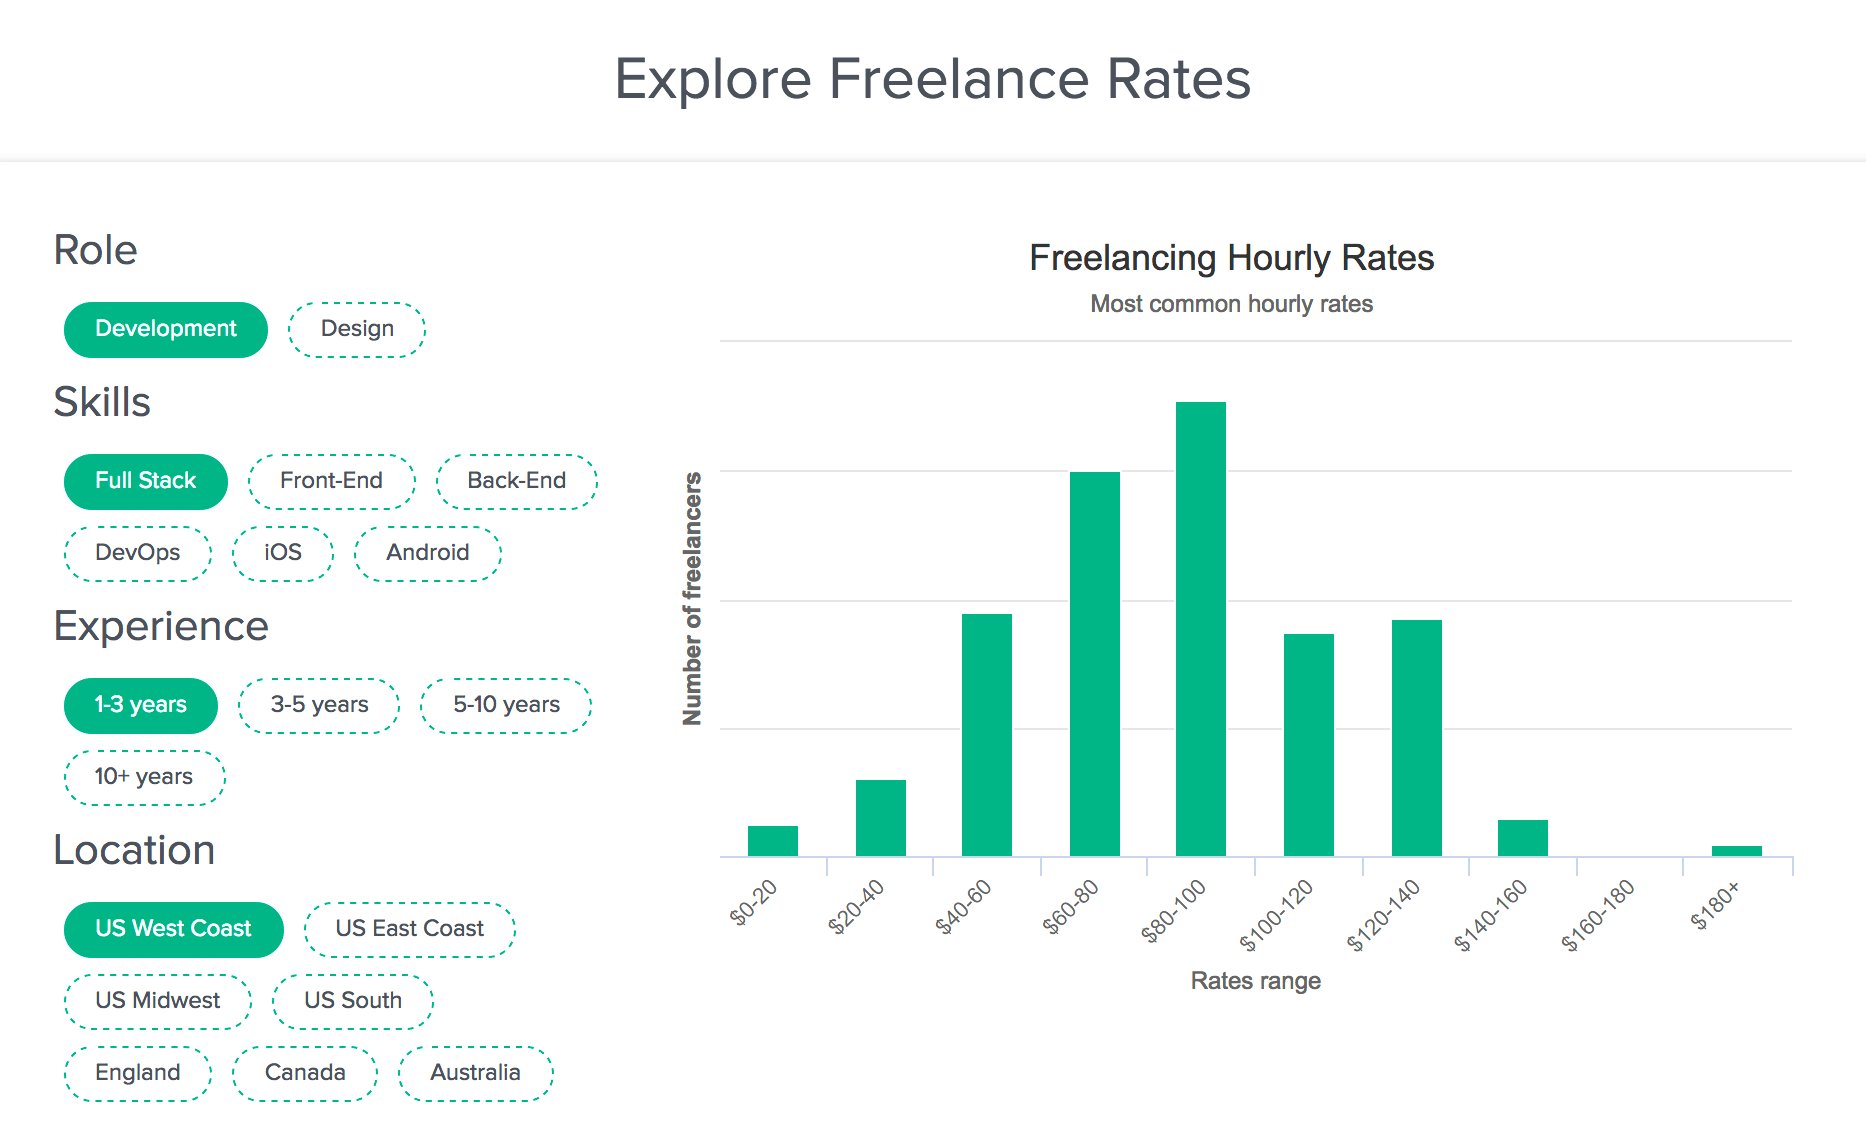 Freelance Rates Explorer